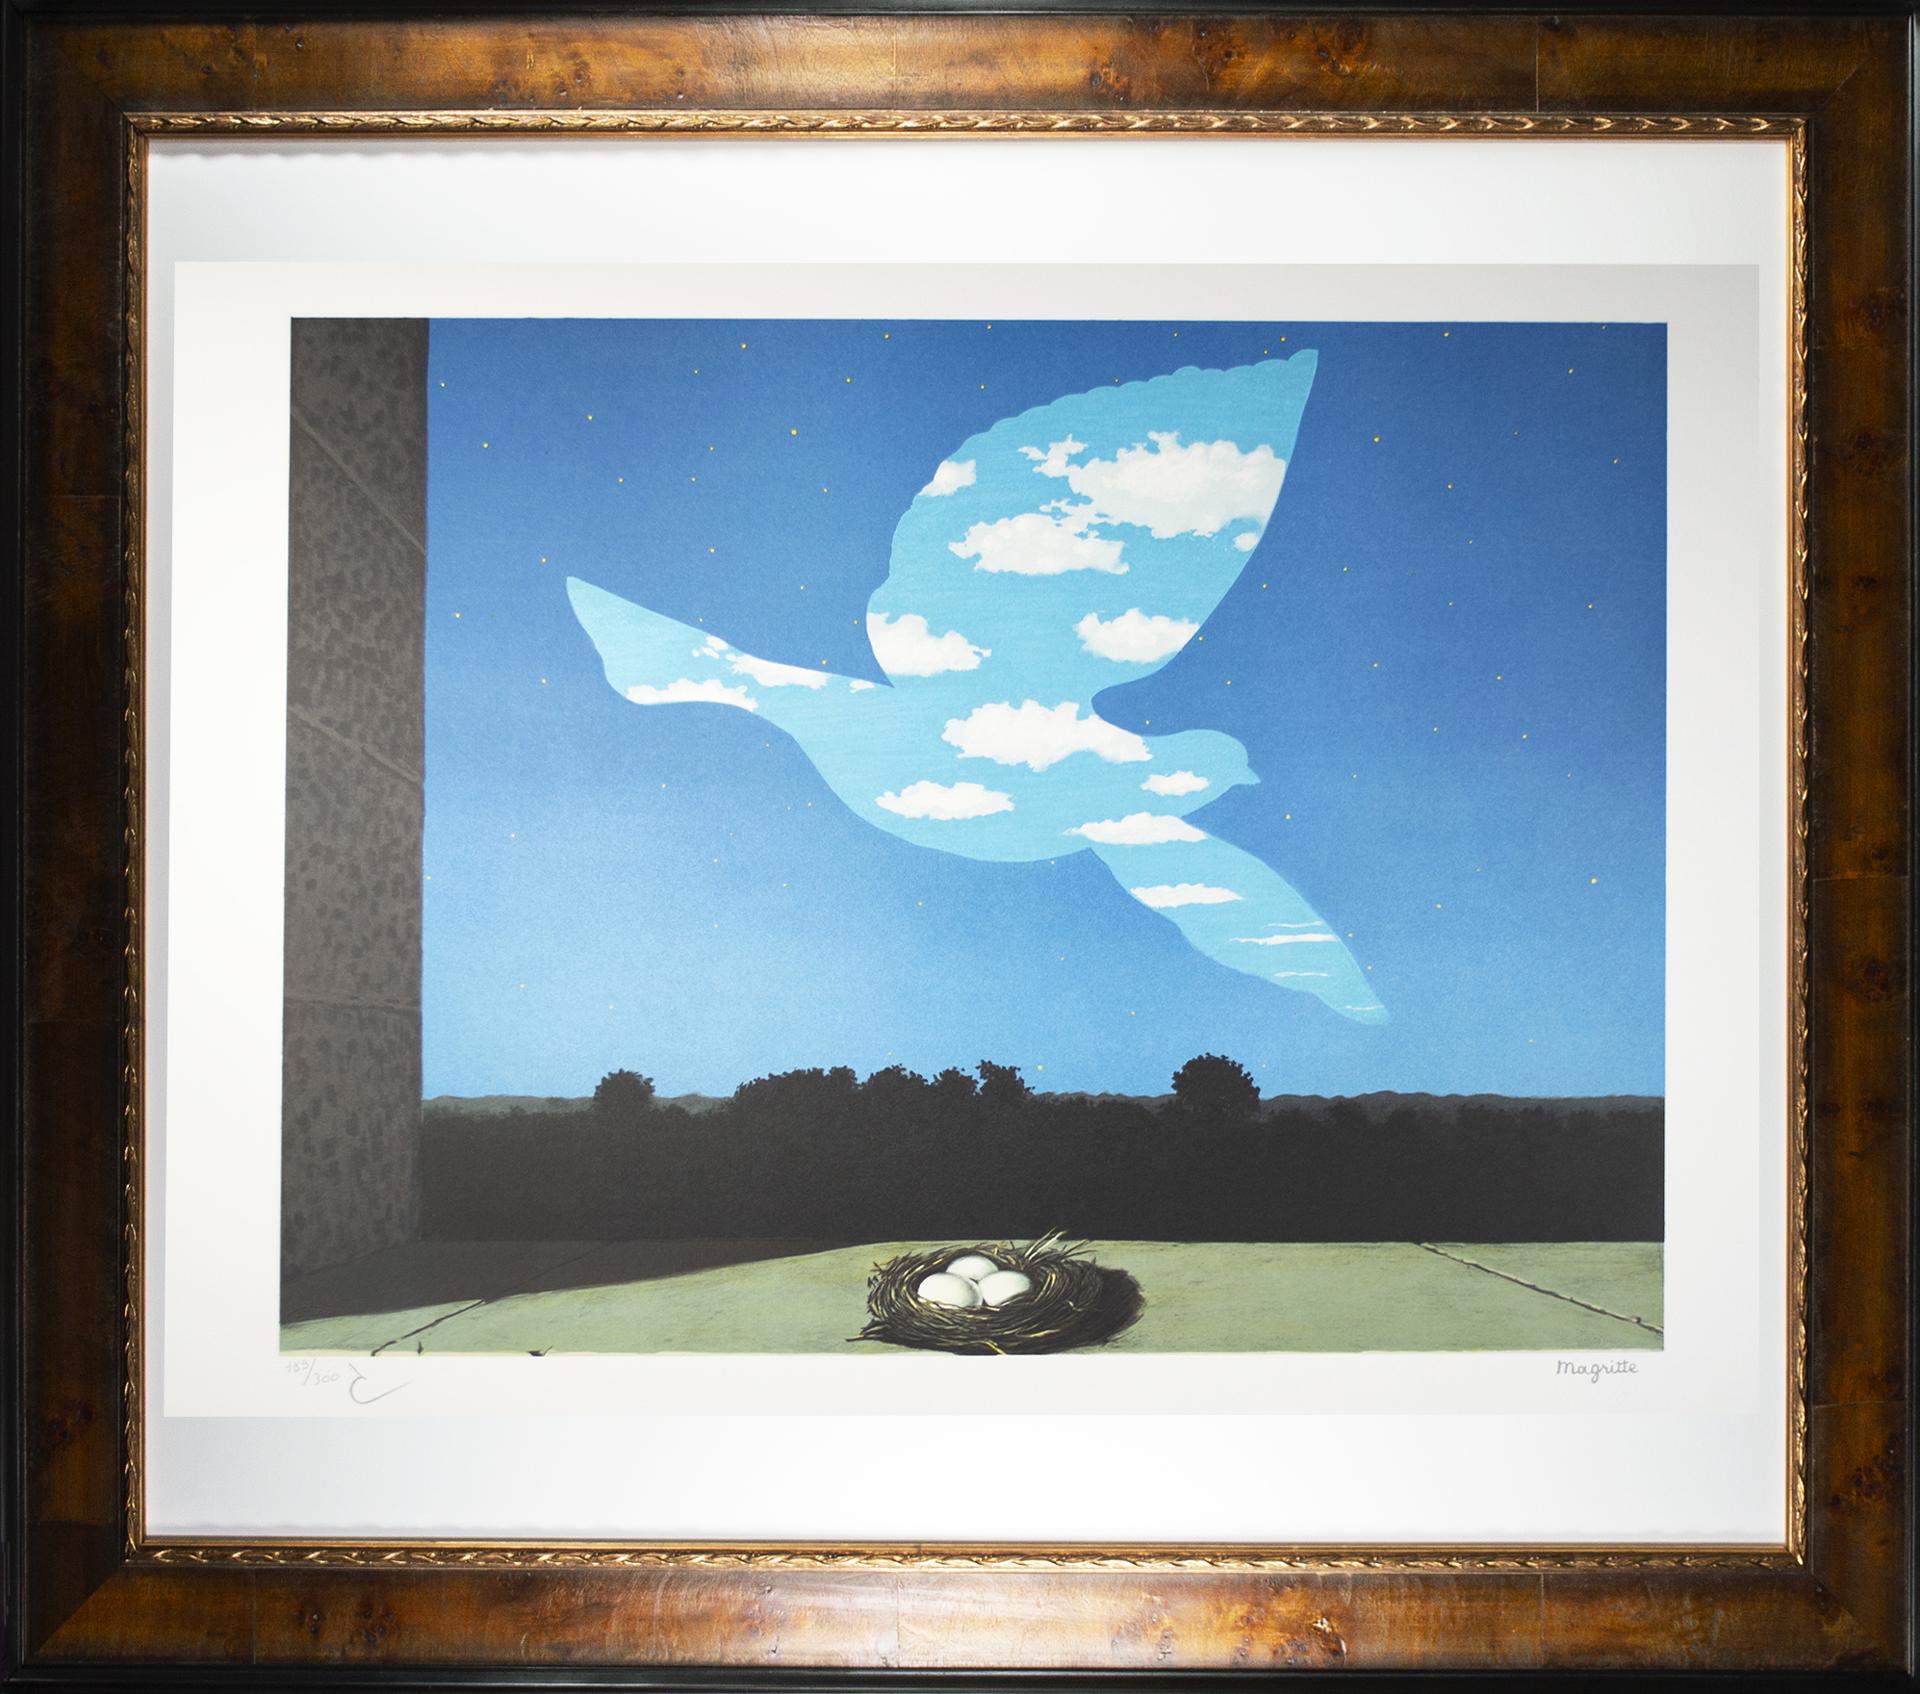 Le Retour (Return) by Rene Magritte